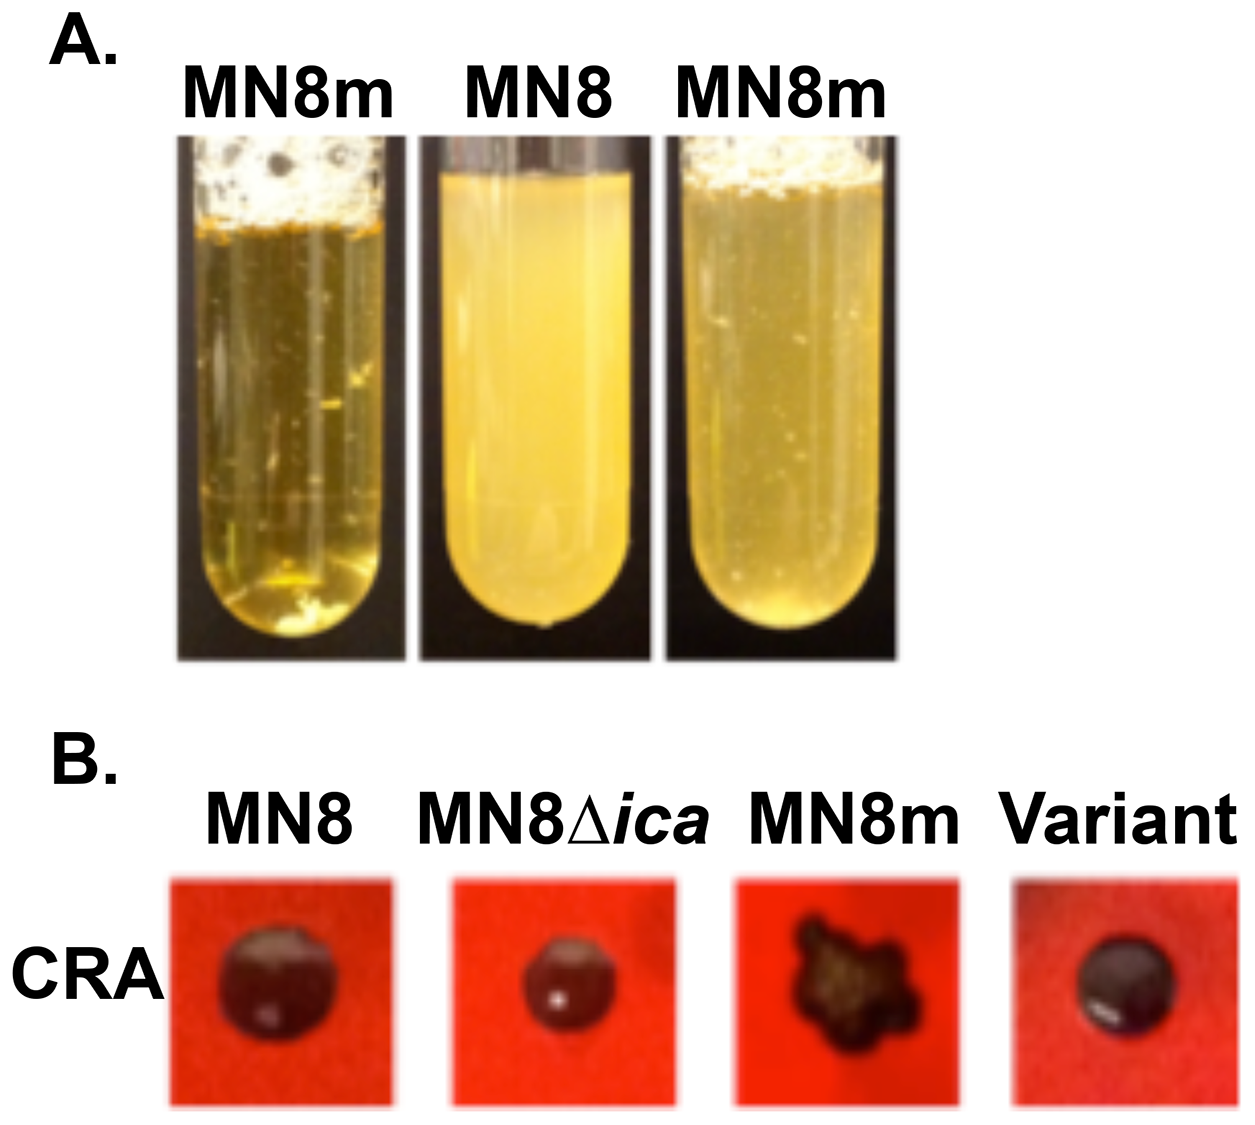 Phenotype characterization of non-mucoid variants isolated from mucoid strain MN8m.